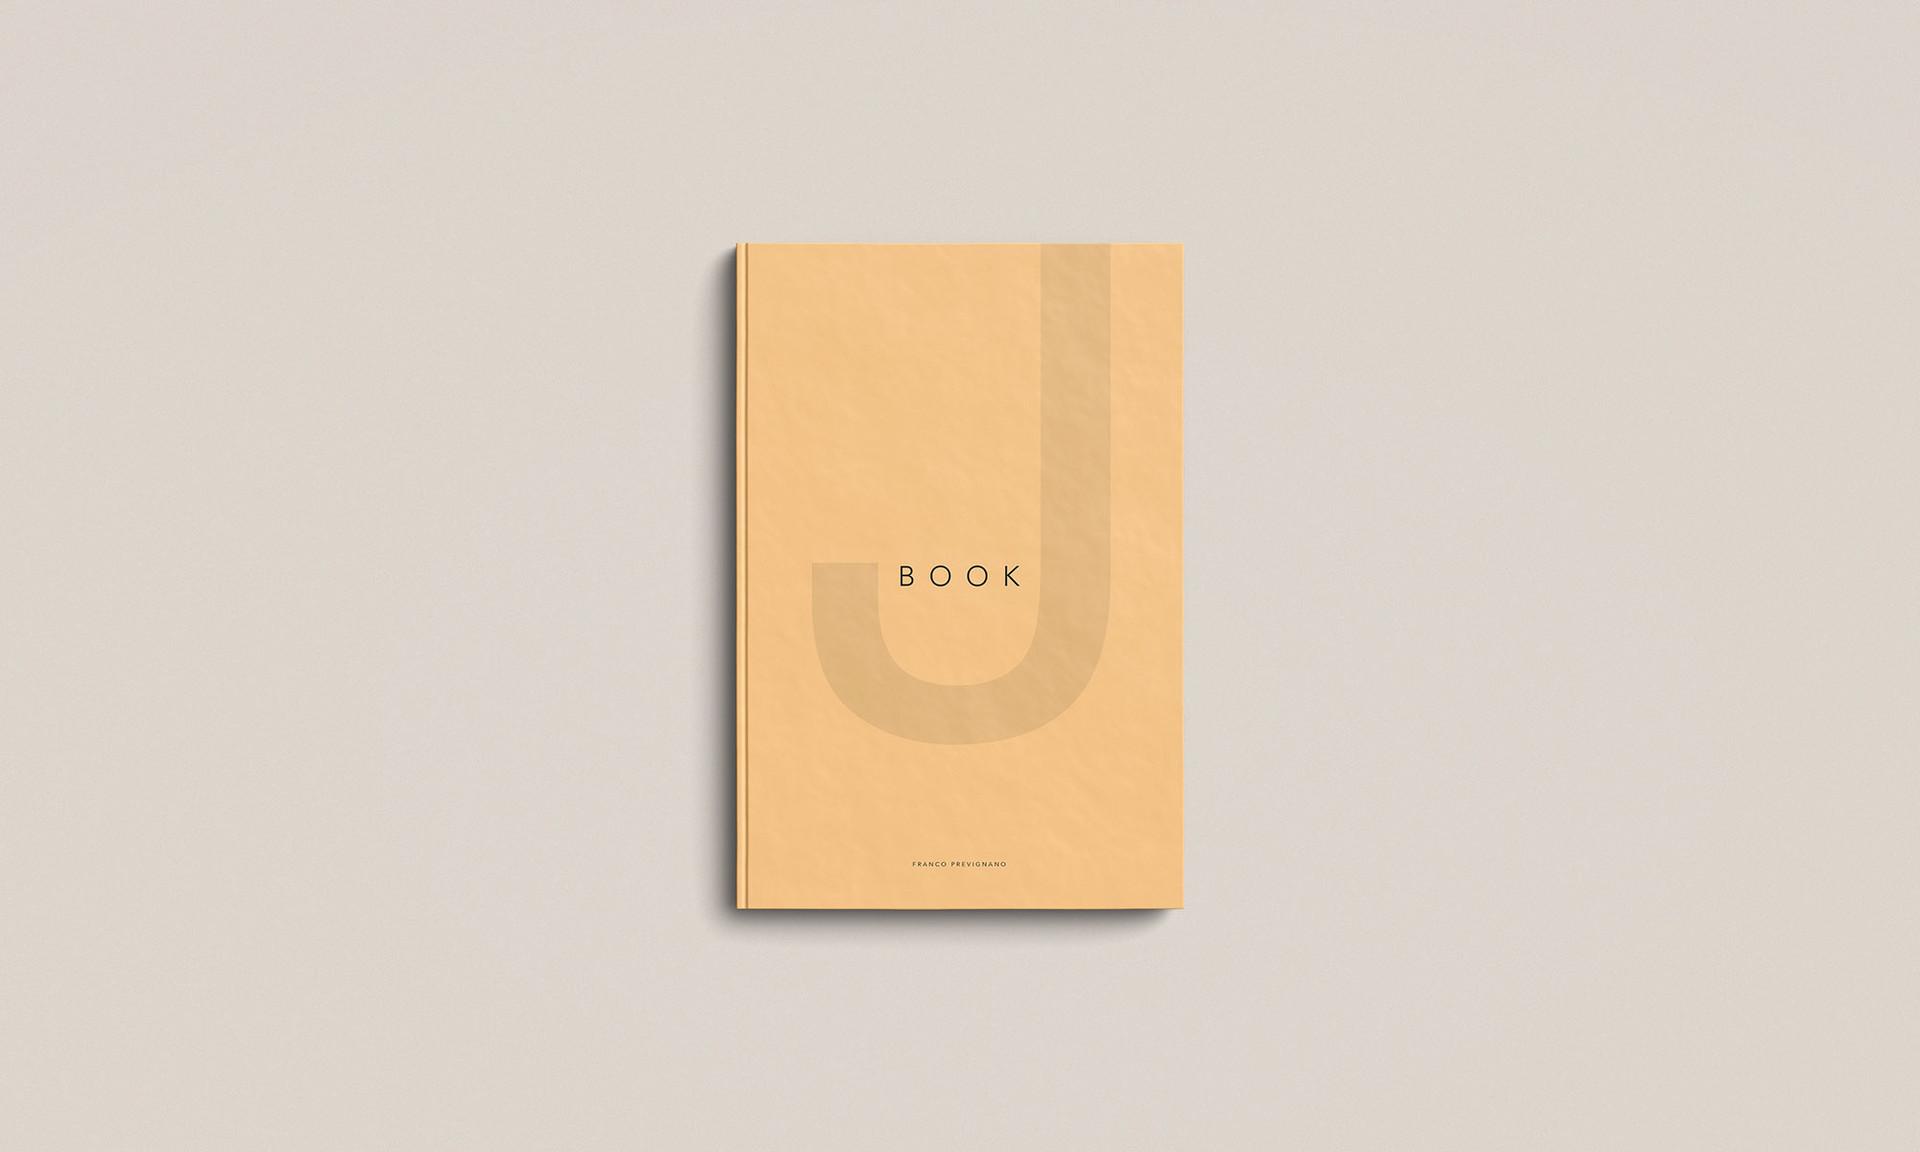 j-book-prevignano-cover.jpg